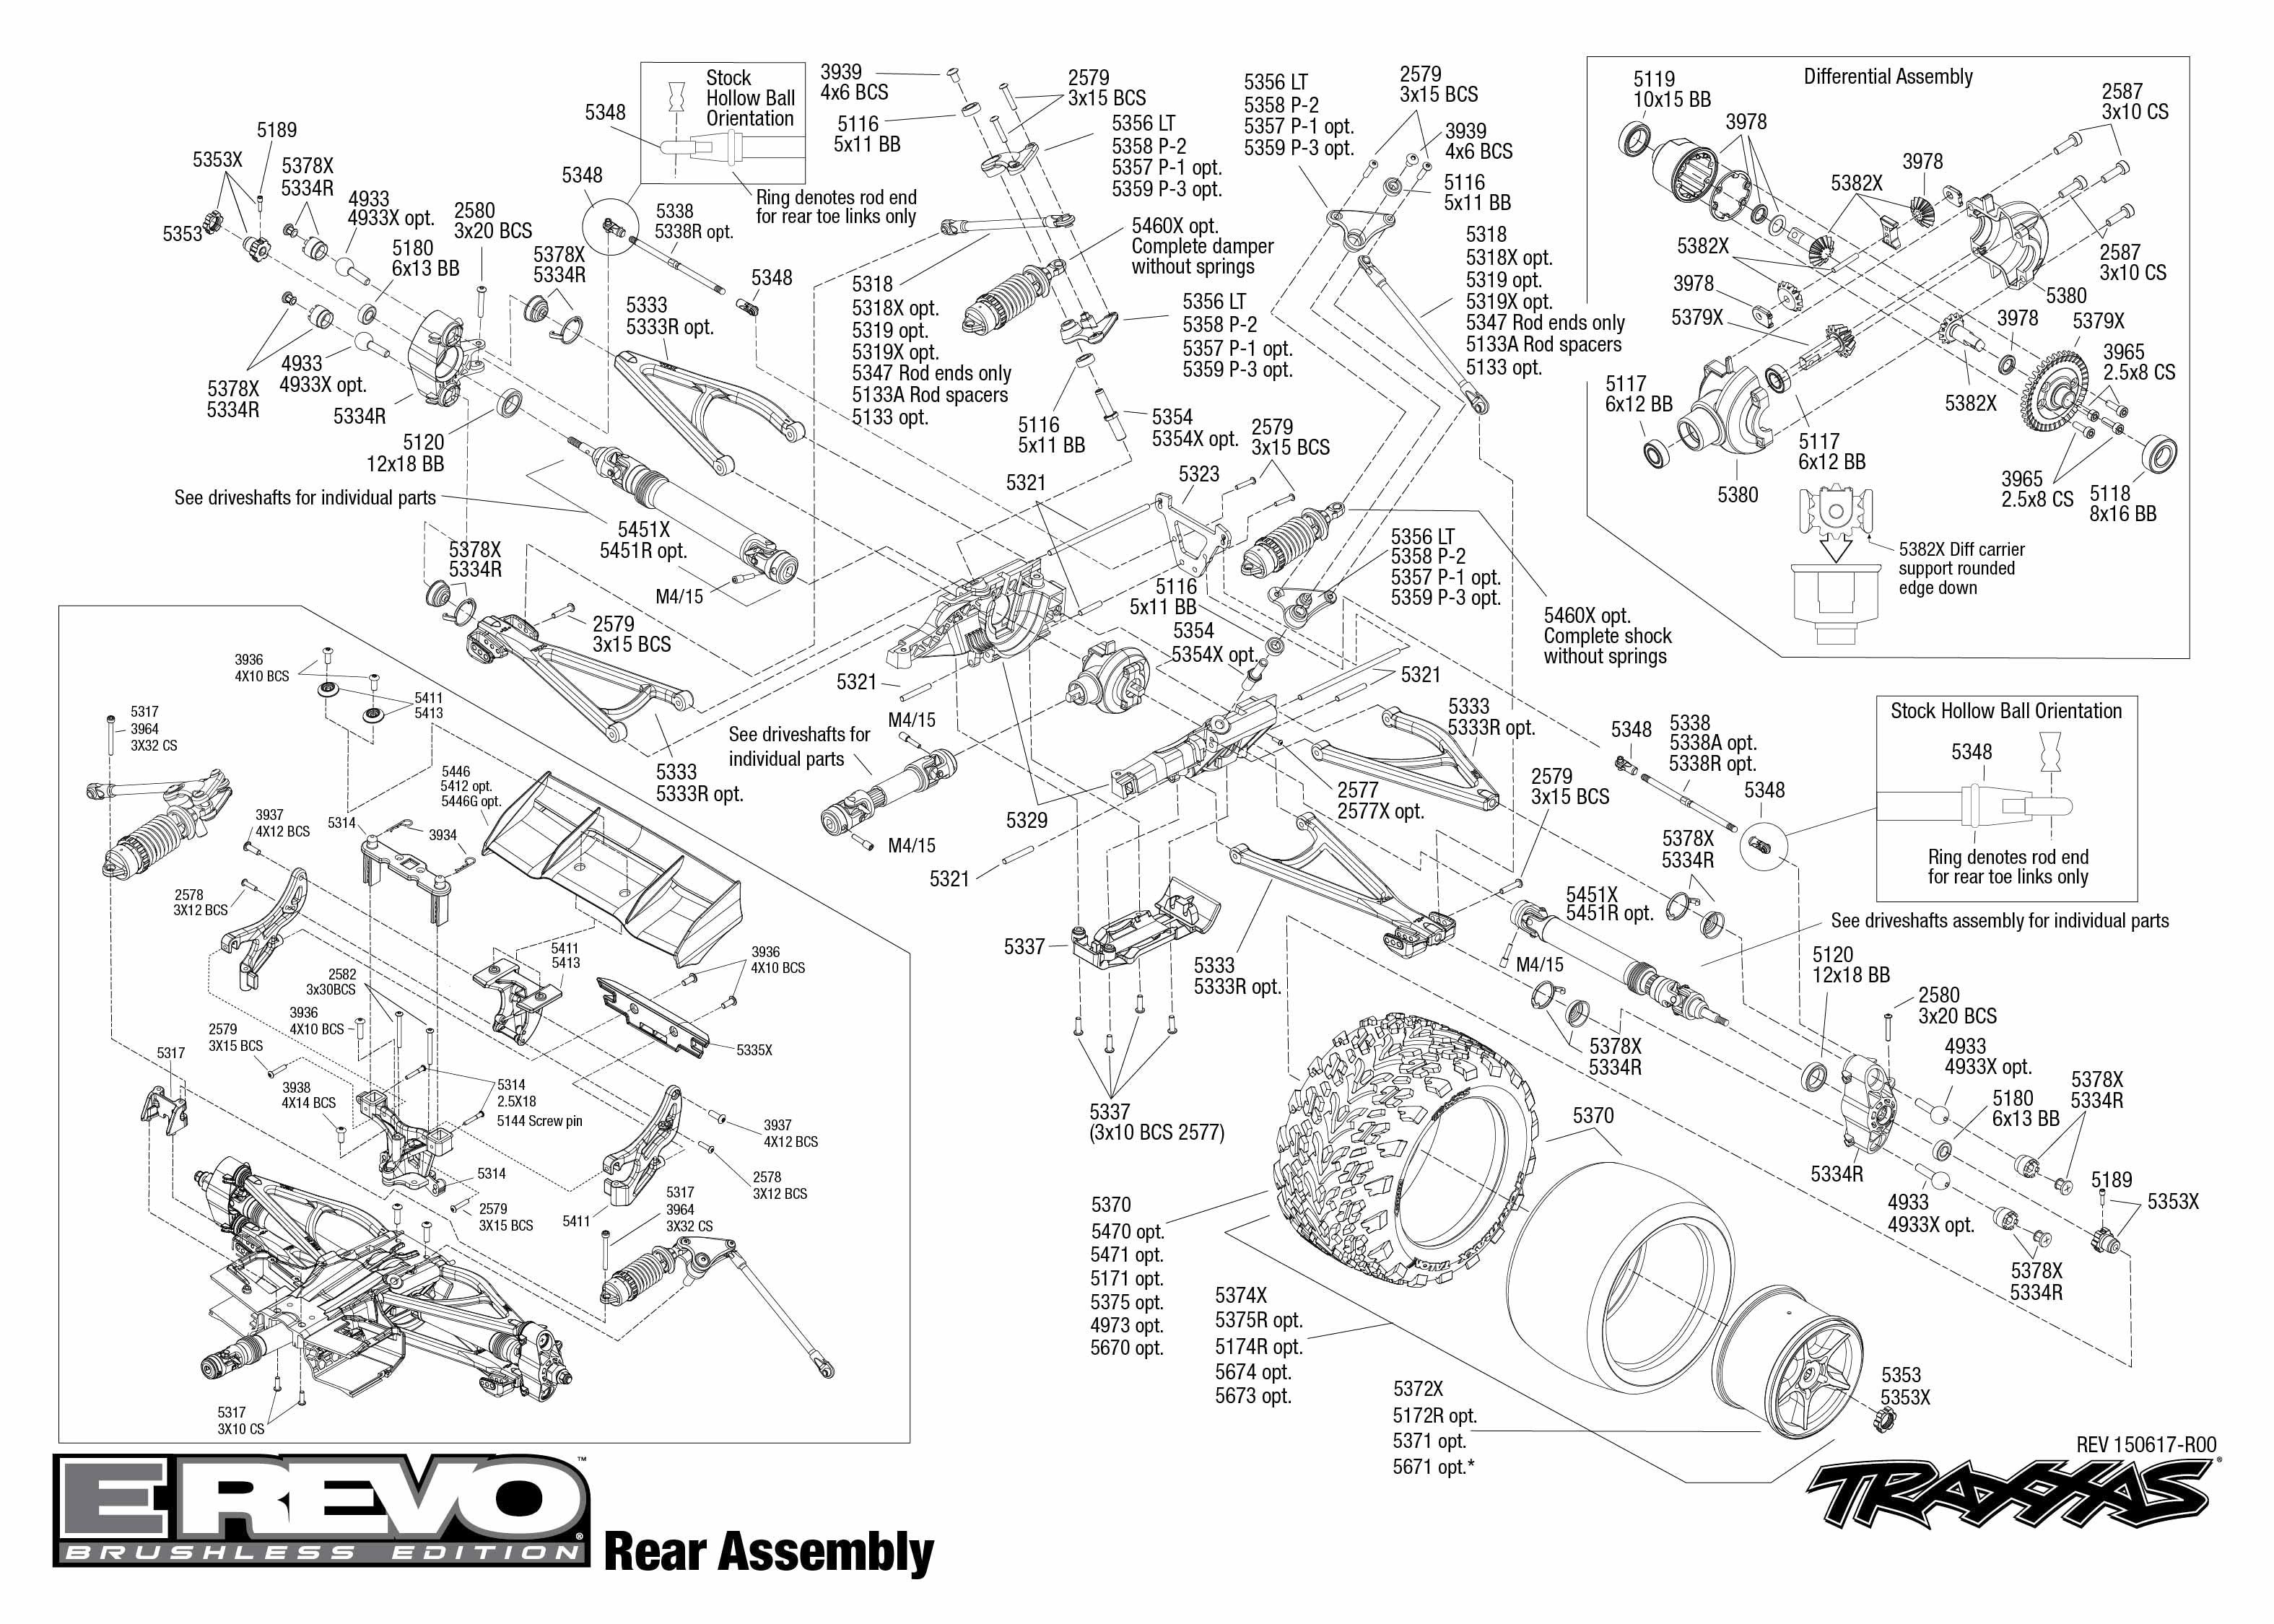 Fordson Super Major Wiring On Wiring Diagram For Fordson Dexta